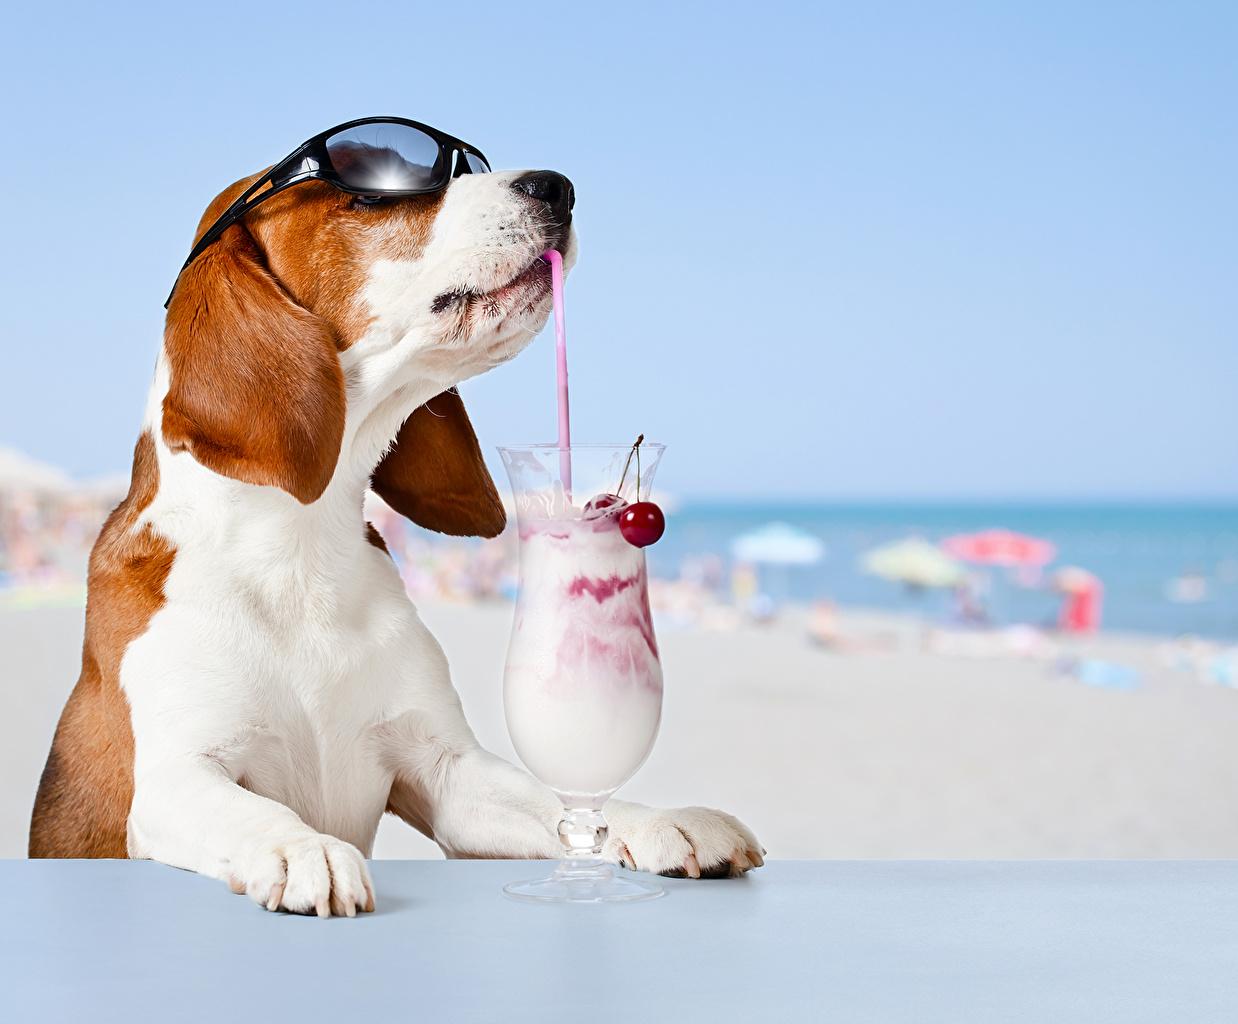 Wallpaper Beagle Dogs Cocktail eyeglasses Animals dog Glasses Mixed drink animal